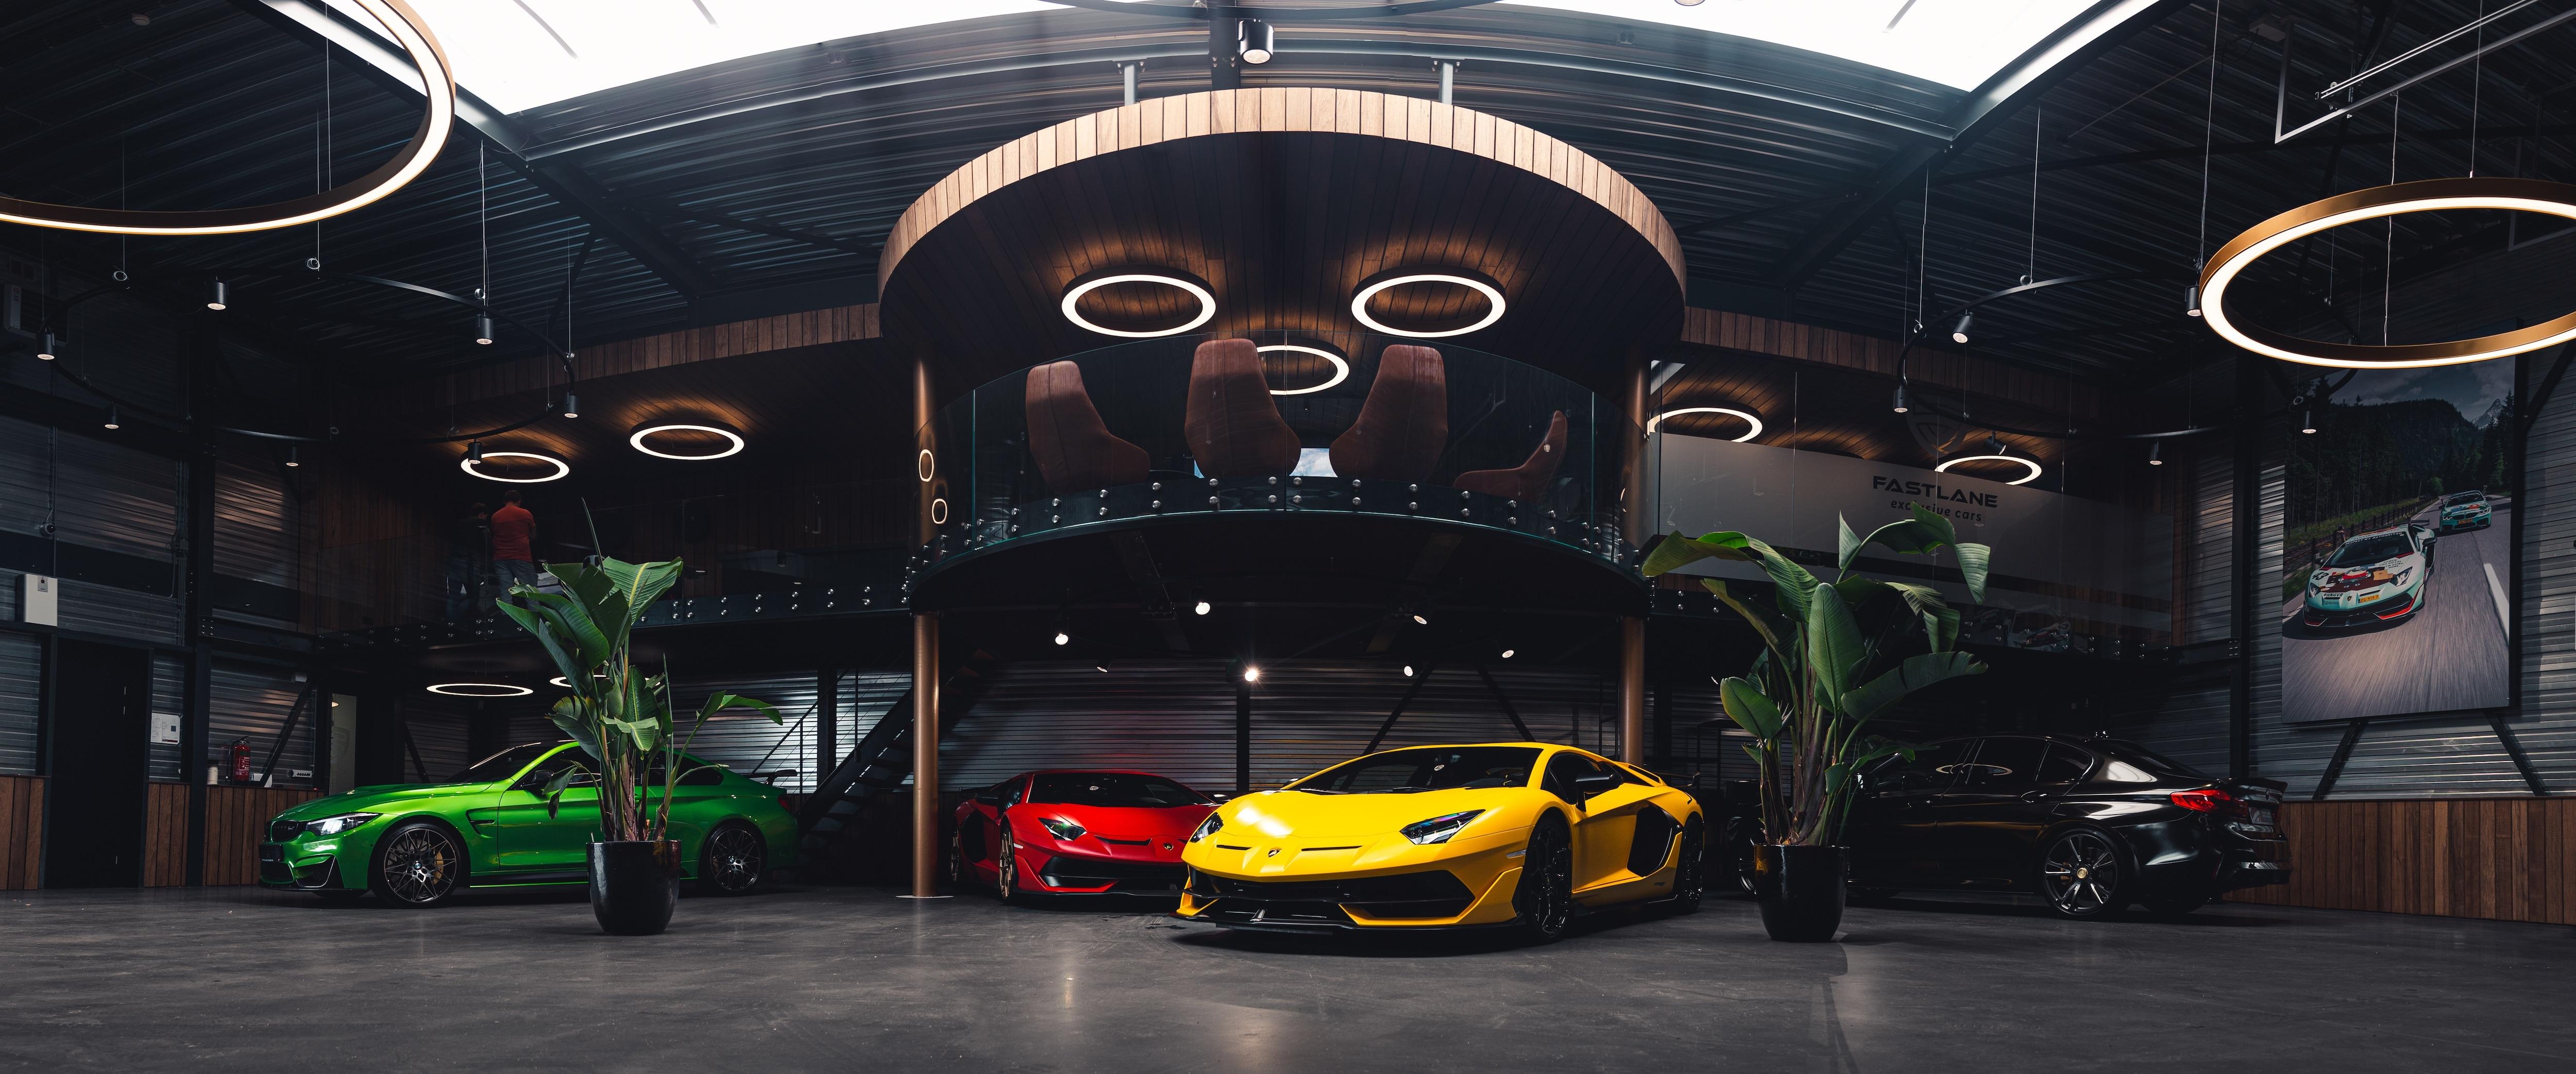 Fastlane Exclusive cars BV